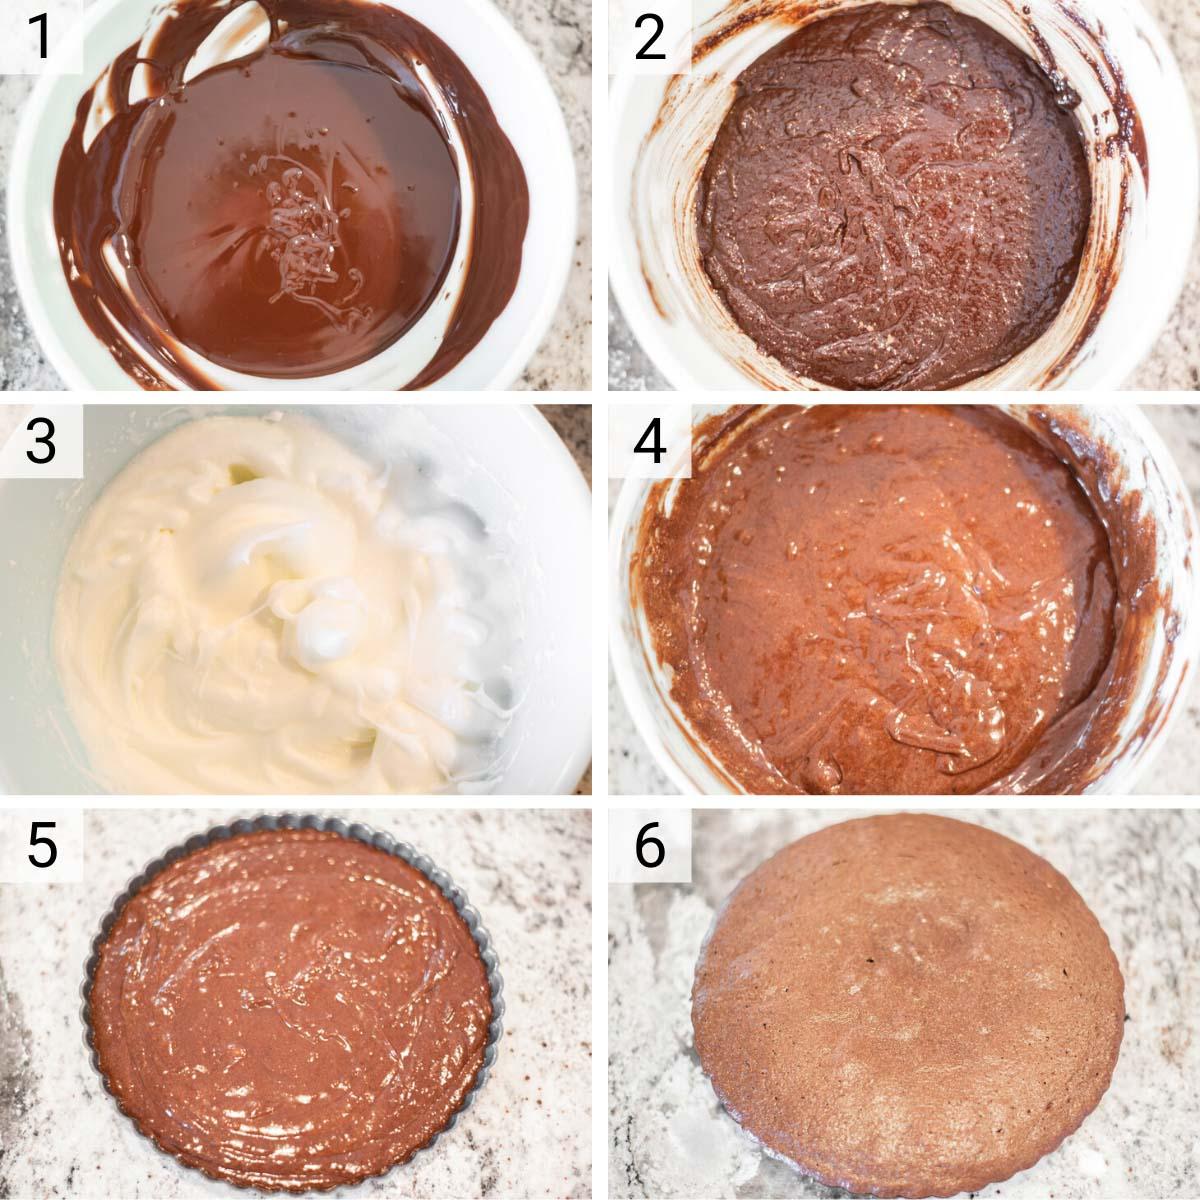 process shots of how to make flourless chocolate cake